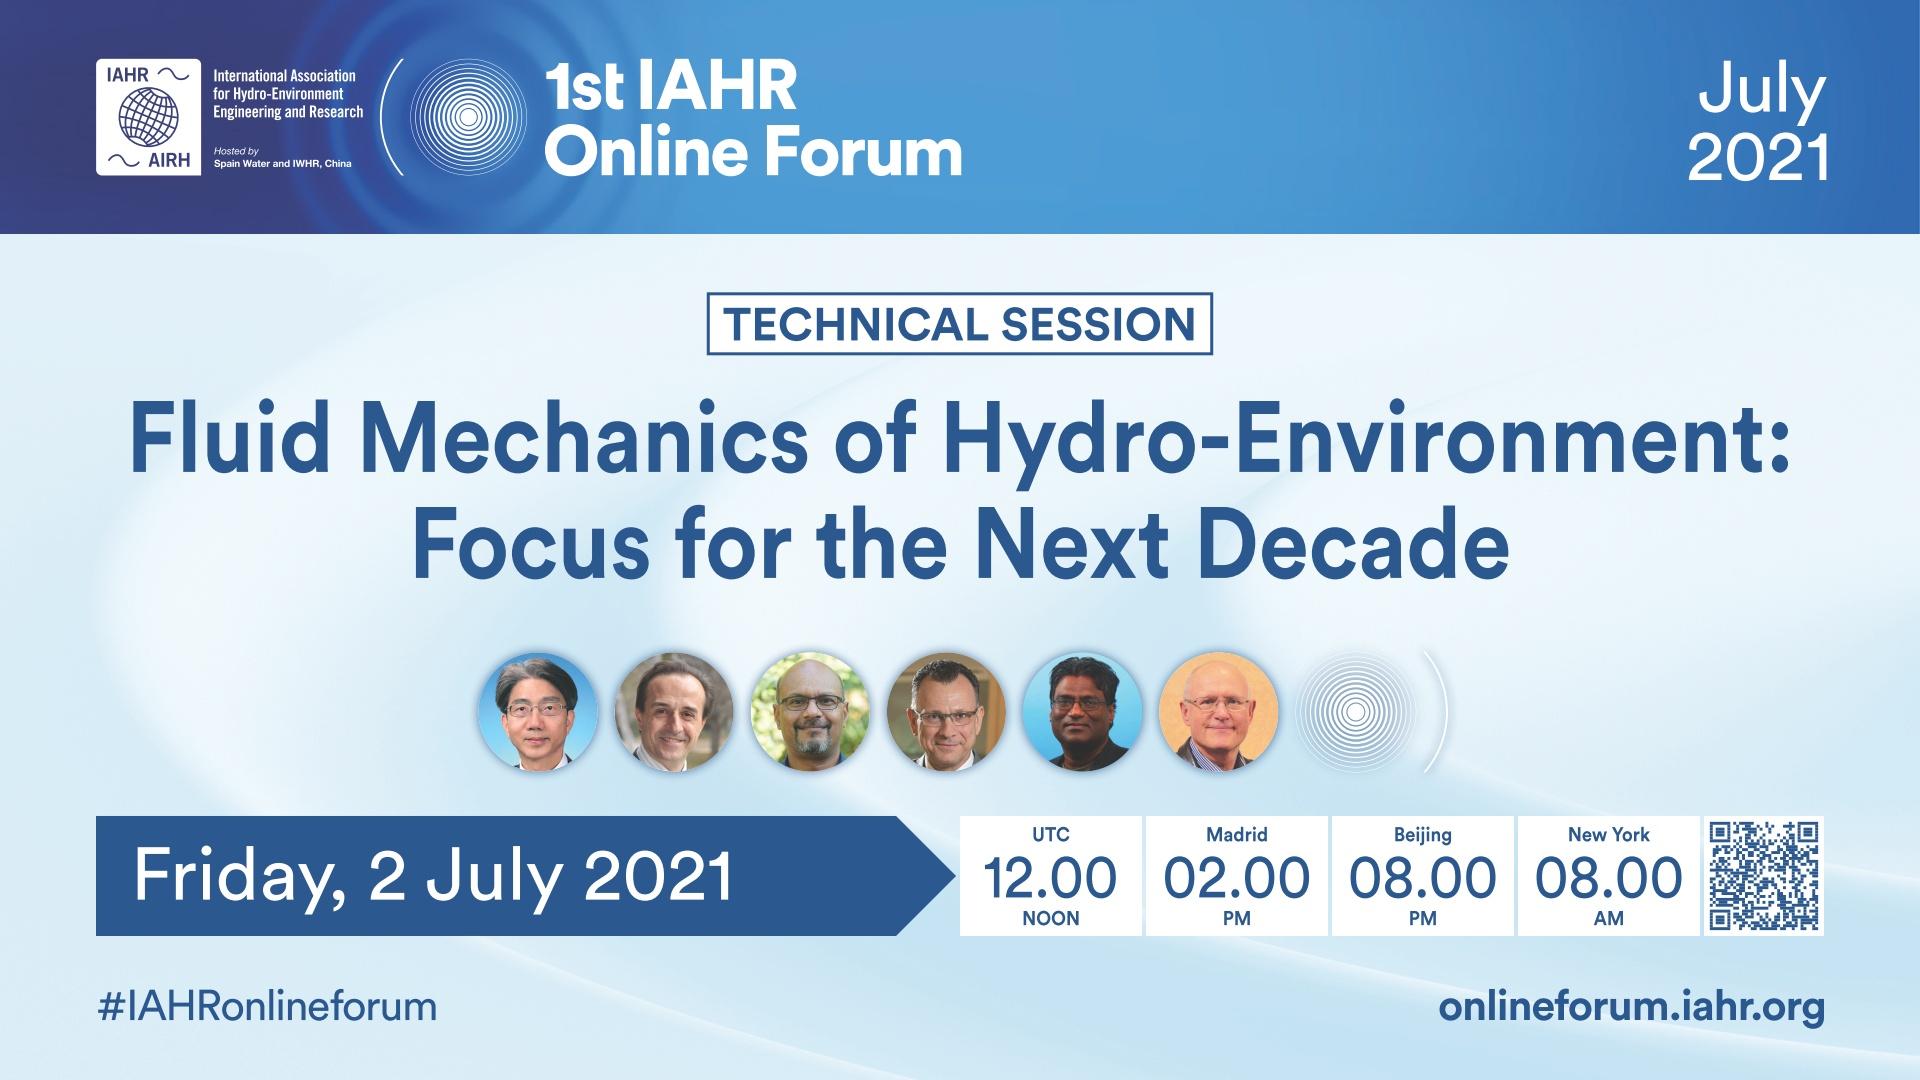 1st IAHR Online Forum: Fluid mechanics of hydro-environment: focus for the next decade